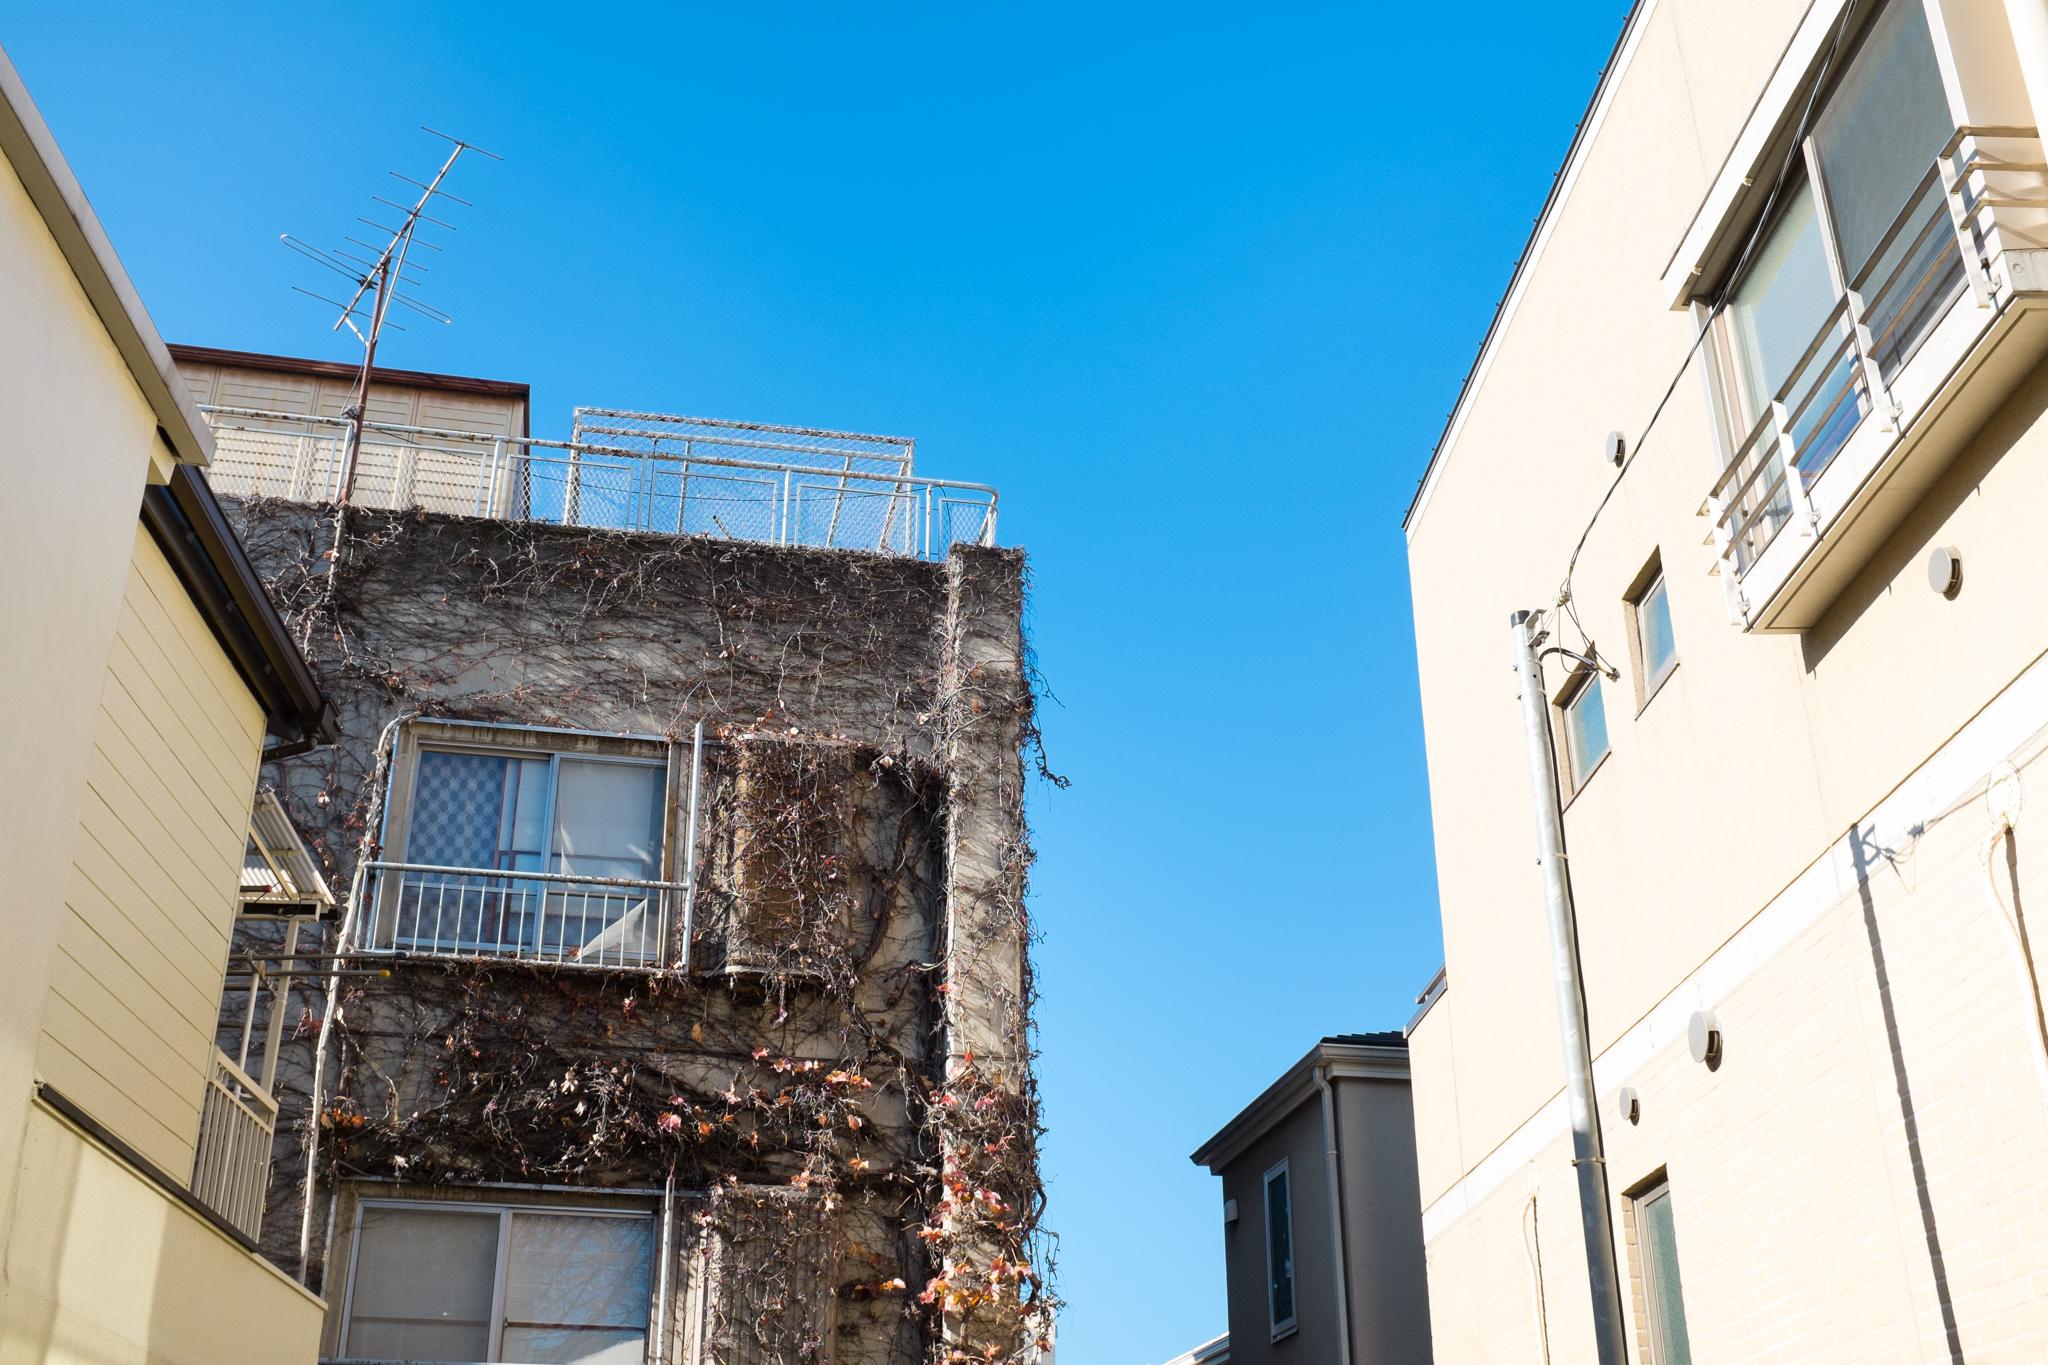 8741-japan-urban-perfect-light.jpg